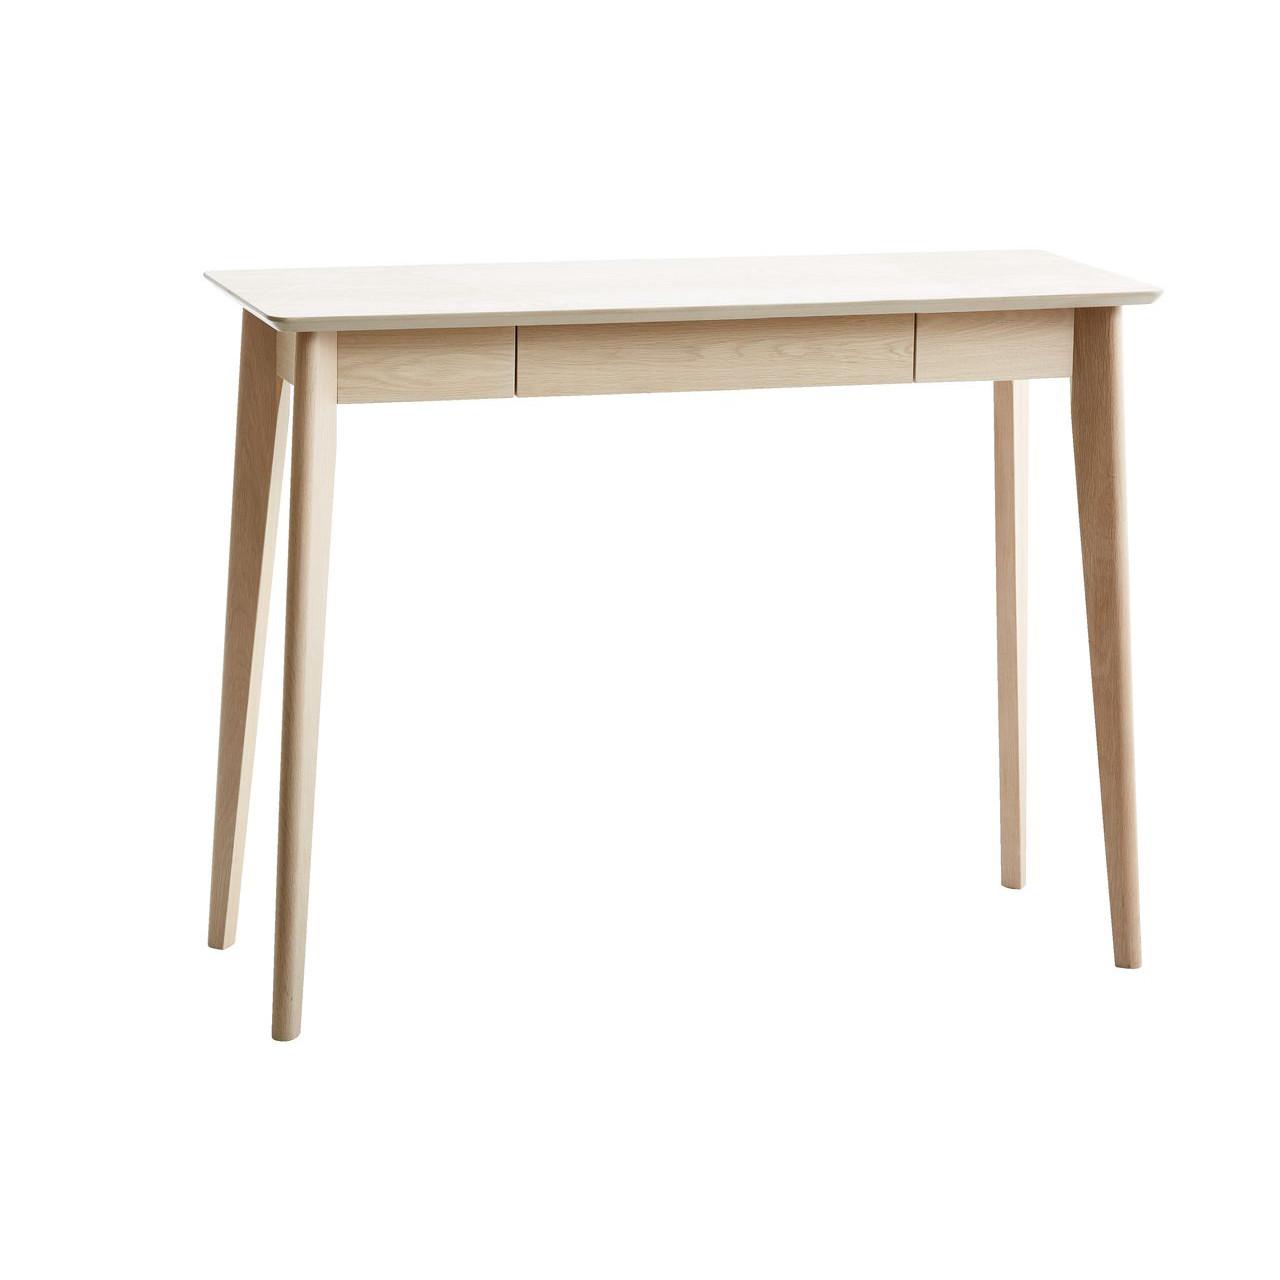 Пристенный столик kalby